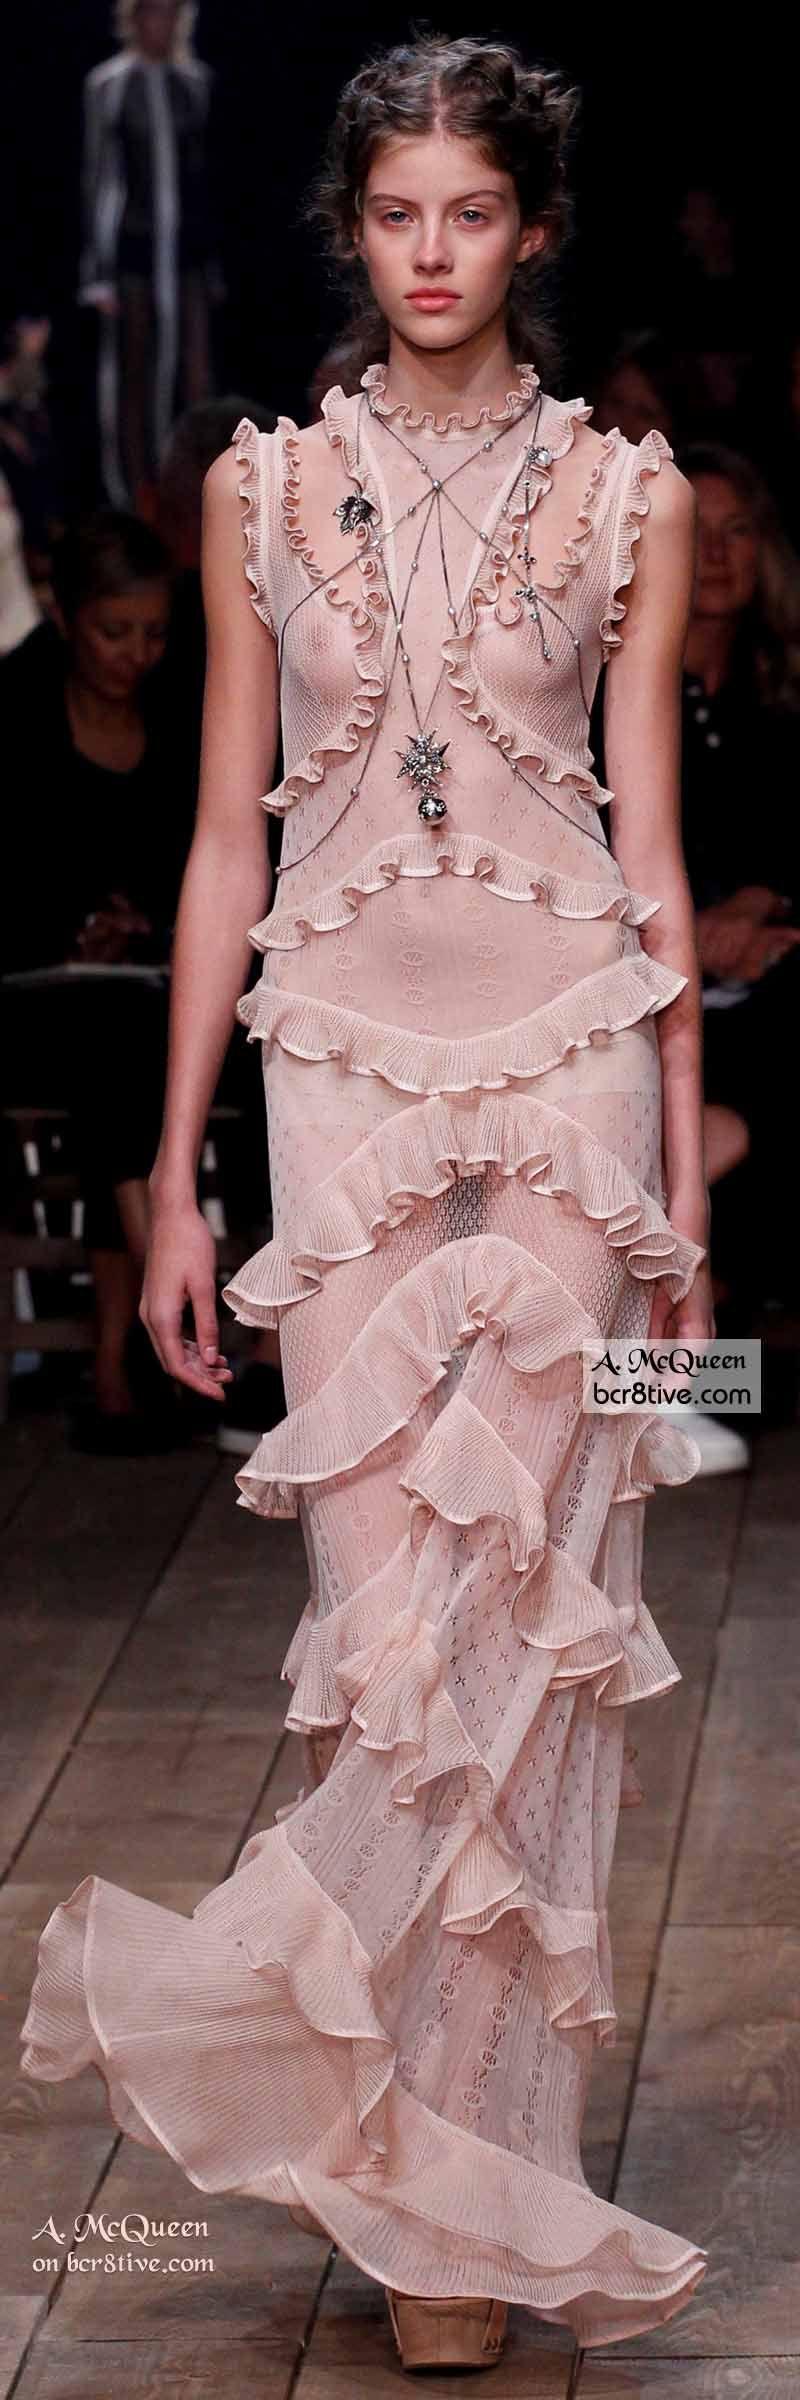 Moderno Vestido De Novia De Alexander Mcqueen Adorno - Colección de ...